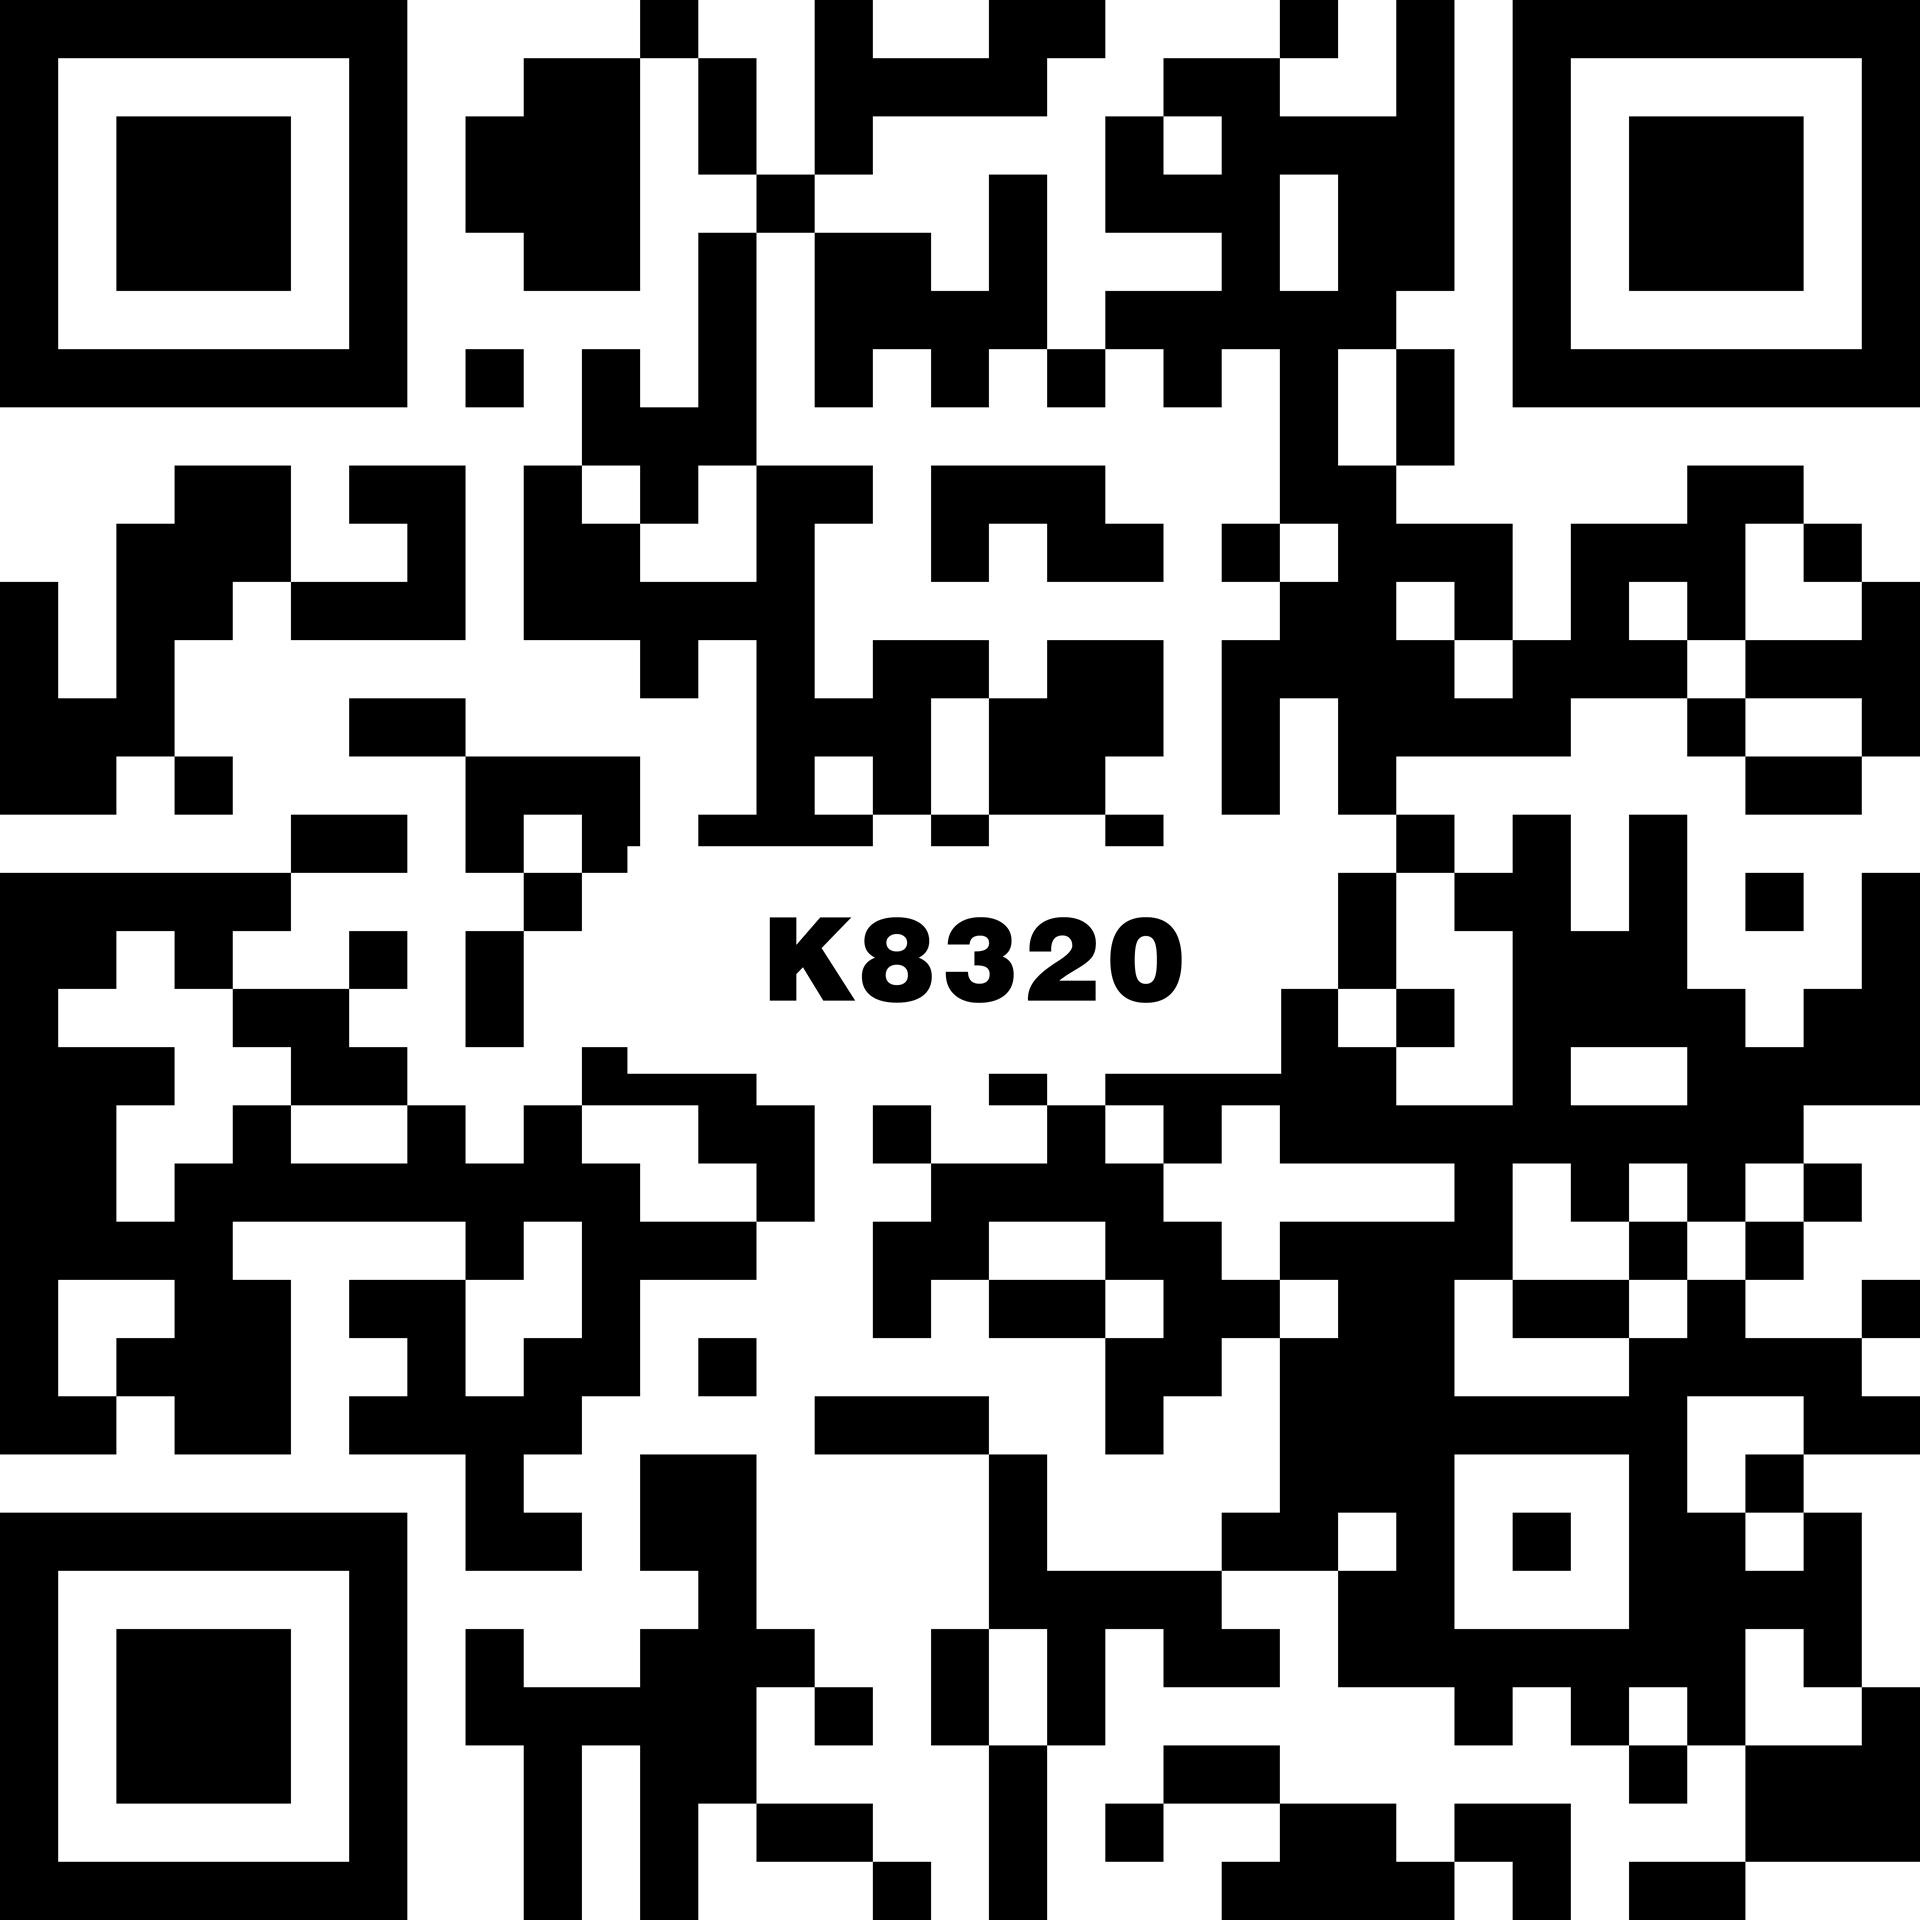 K8320